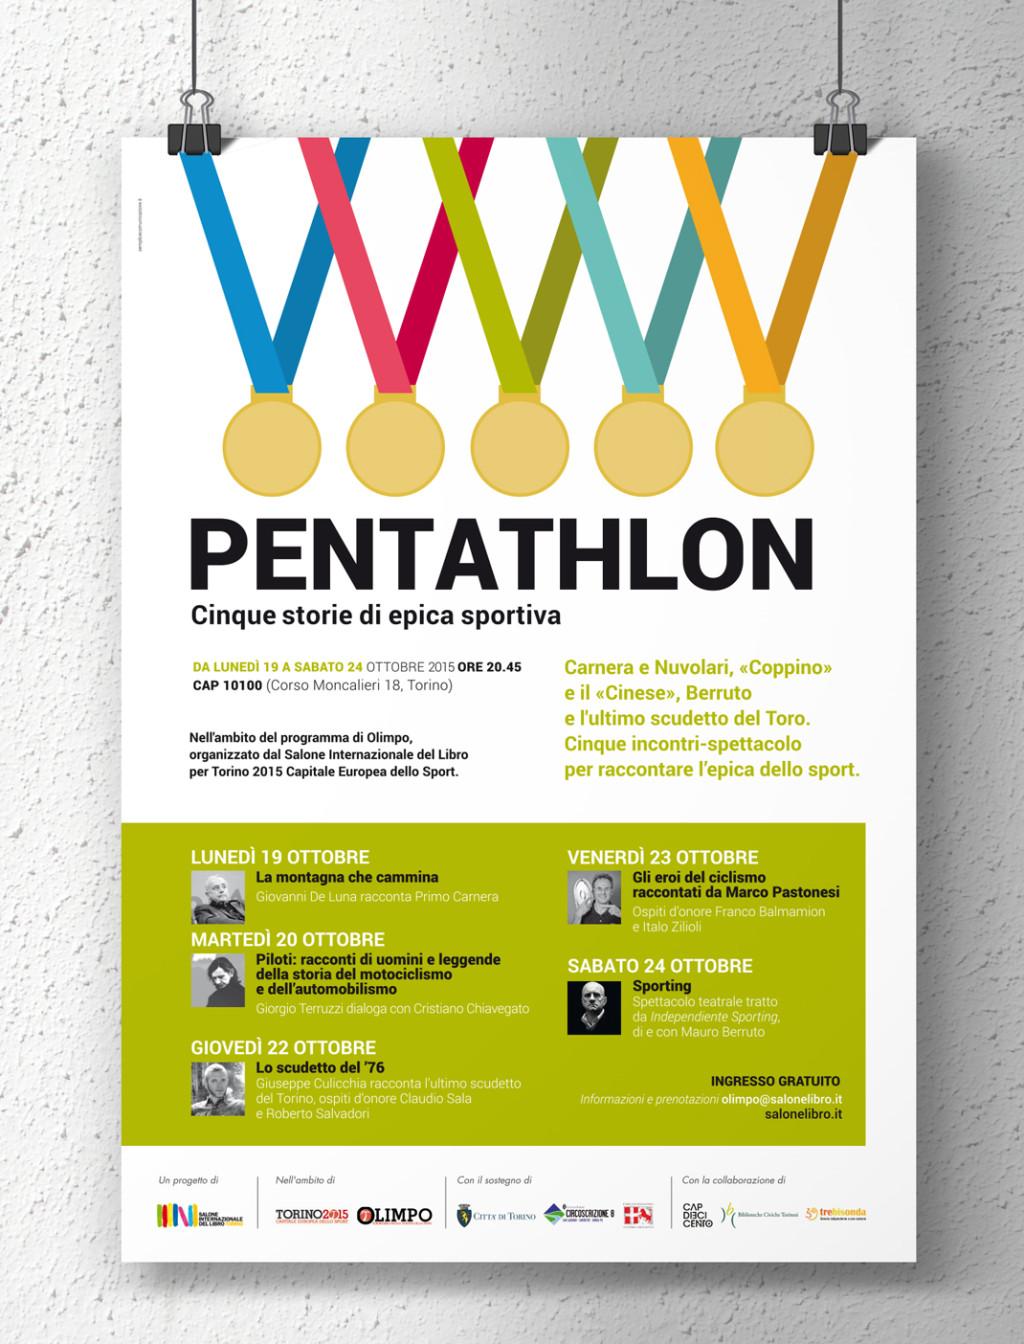 Pentathlon. Cinque storie di epica sportiva